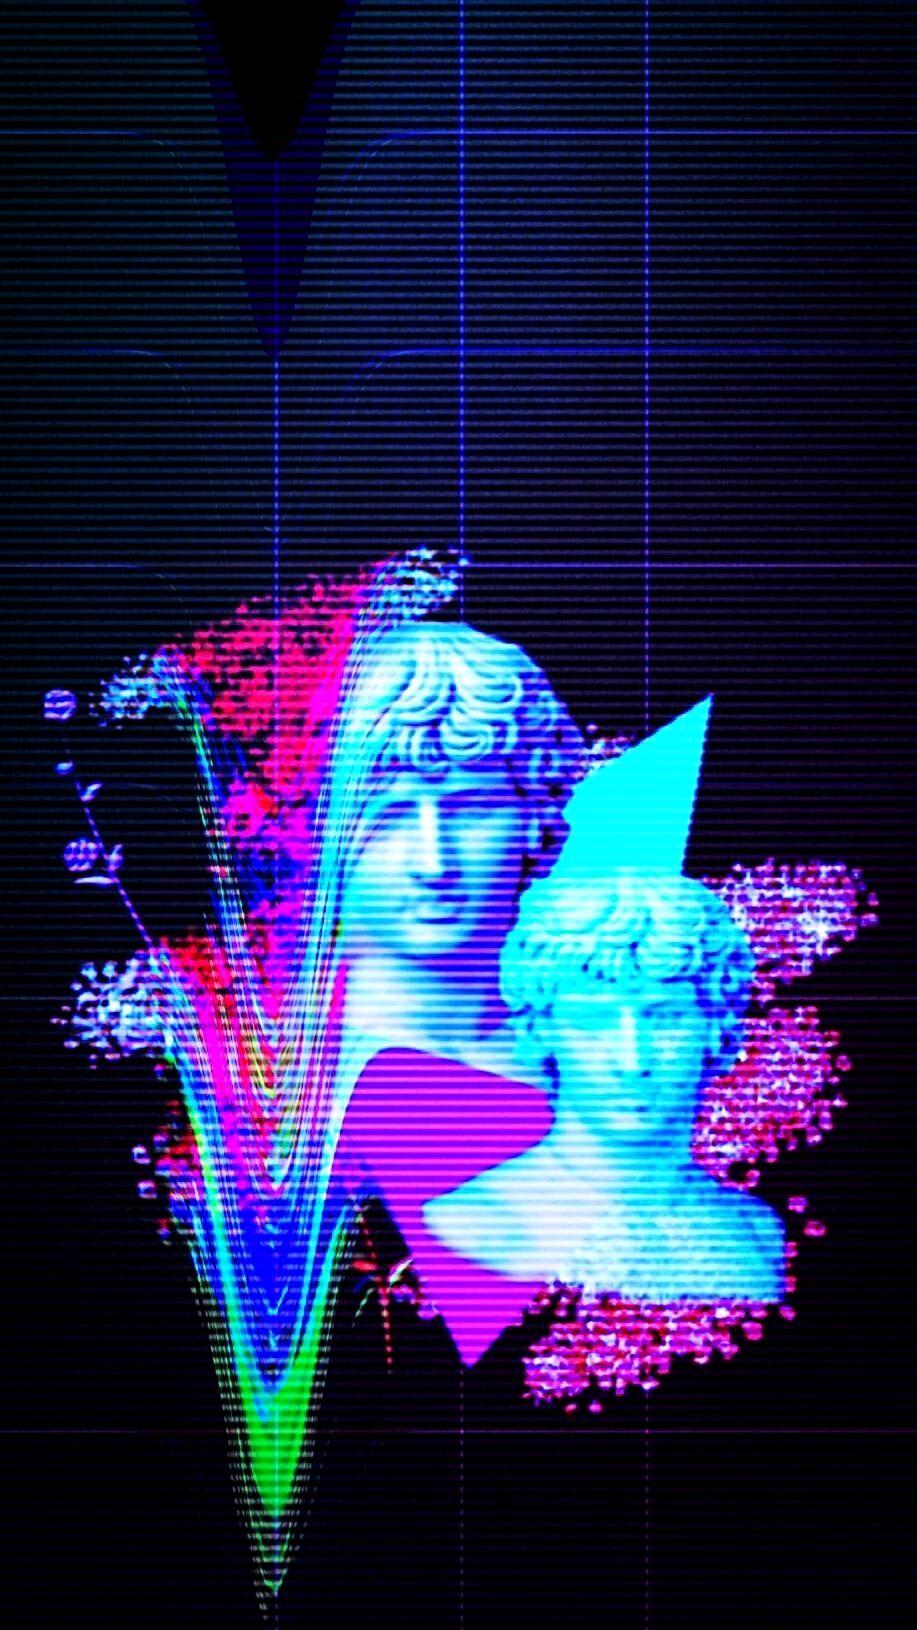 Wallpaper 4K Vaporwave Trick in 2020 | Vaporwave wallpaper ...